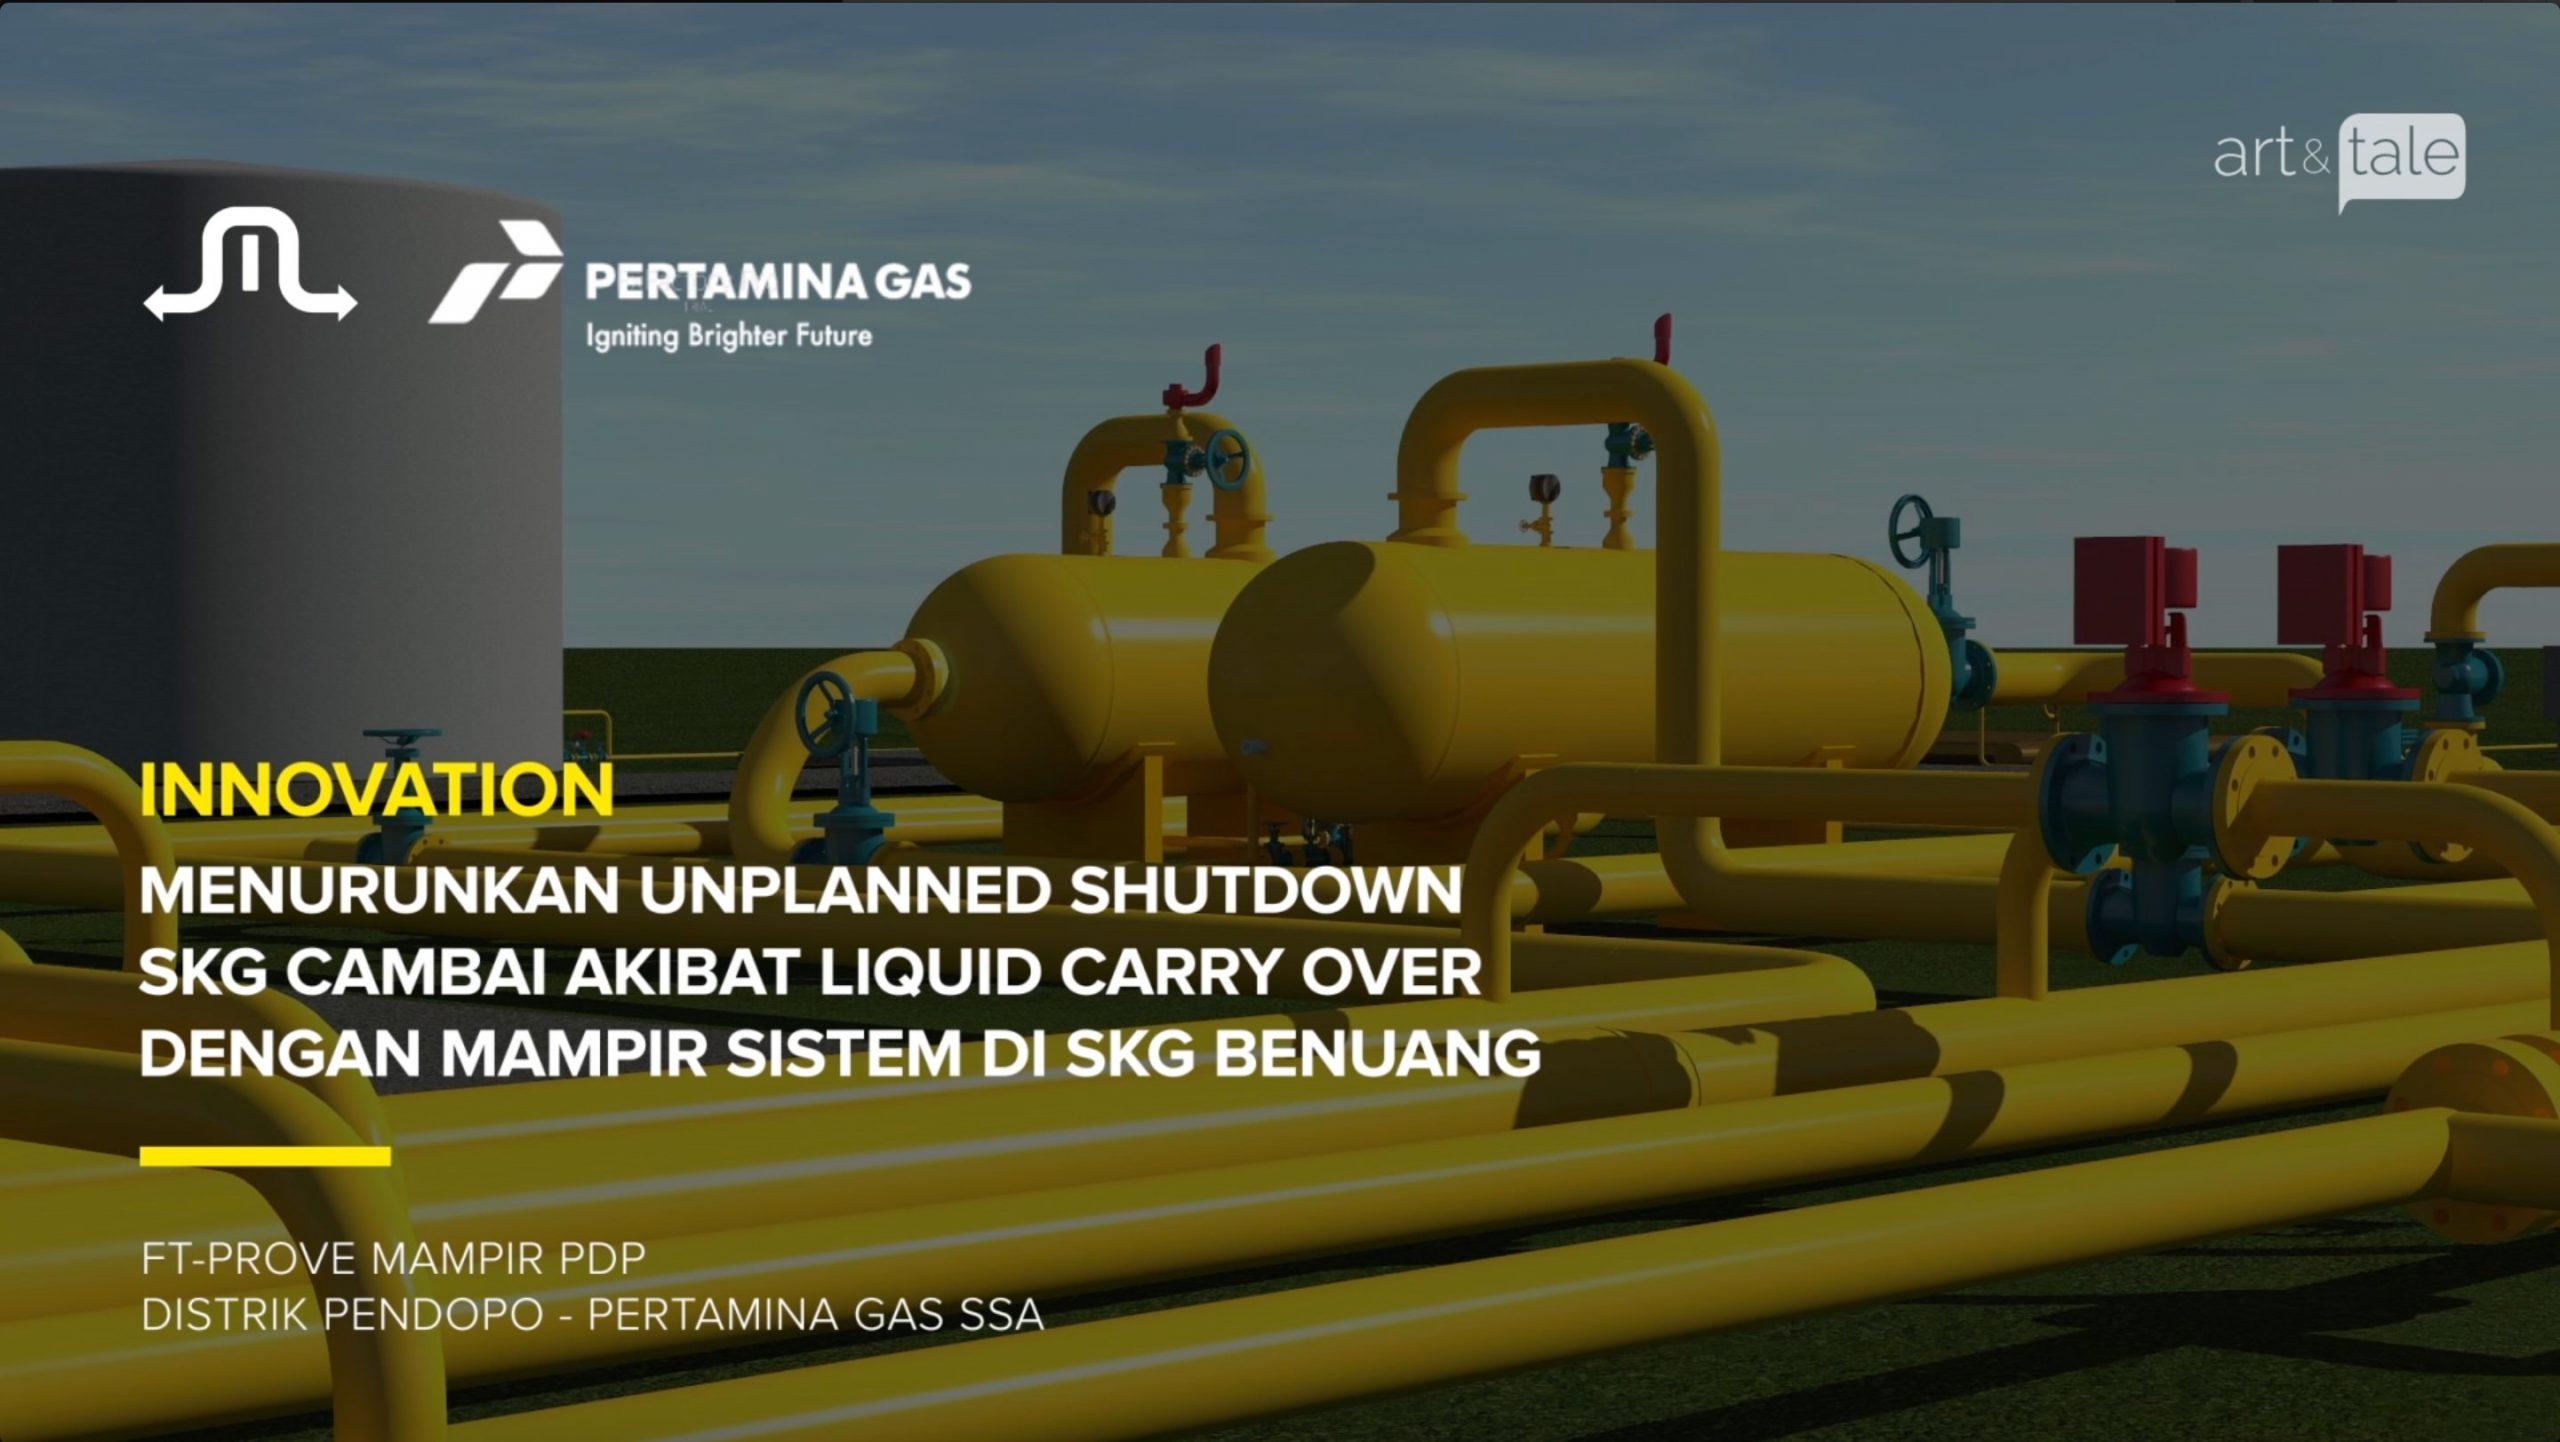 Pertamina Gas - SKG Benuang